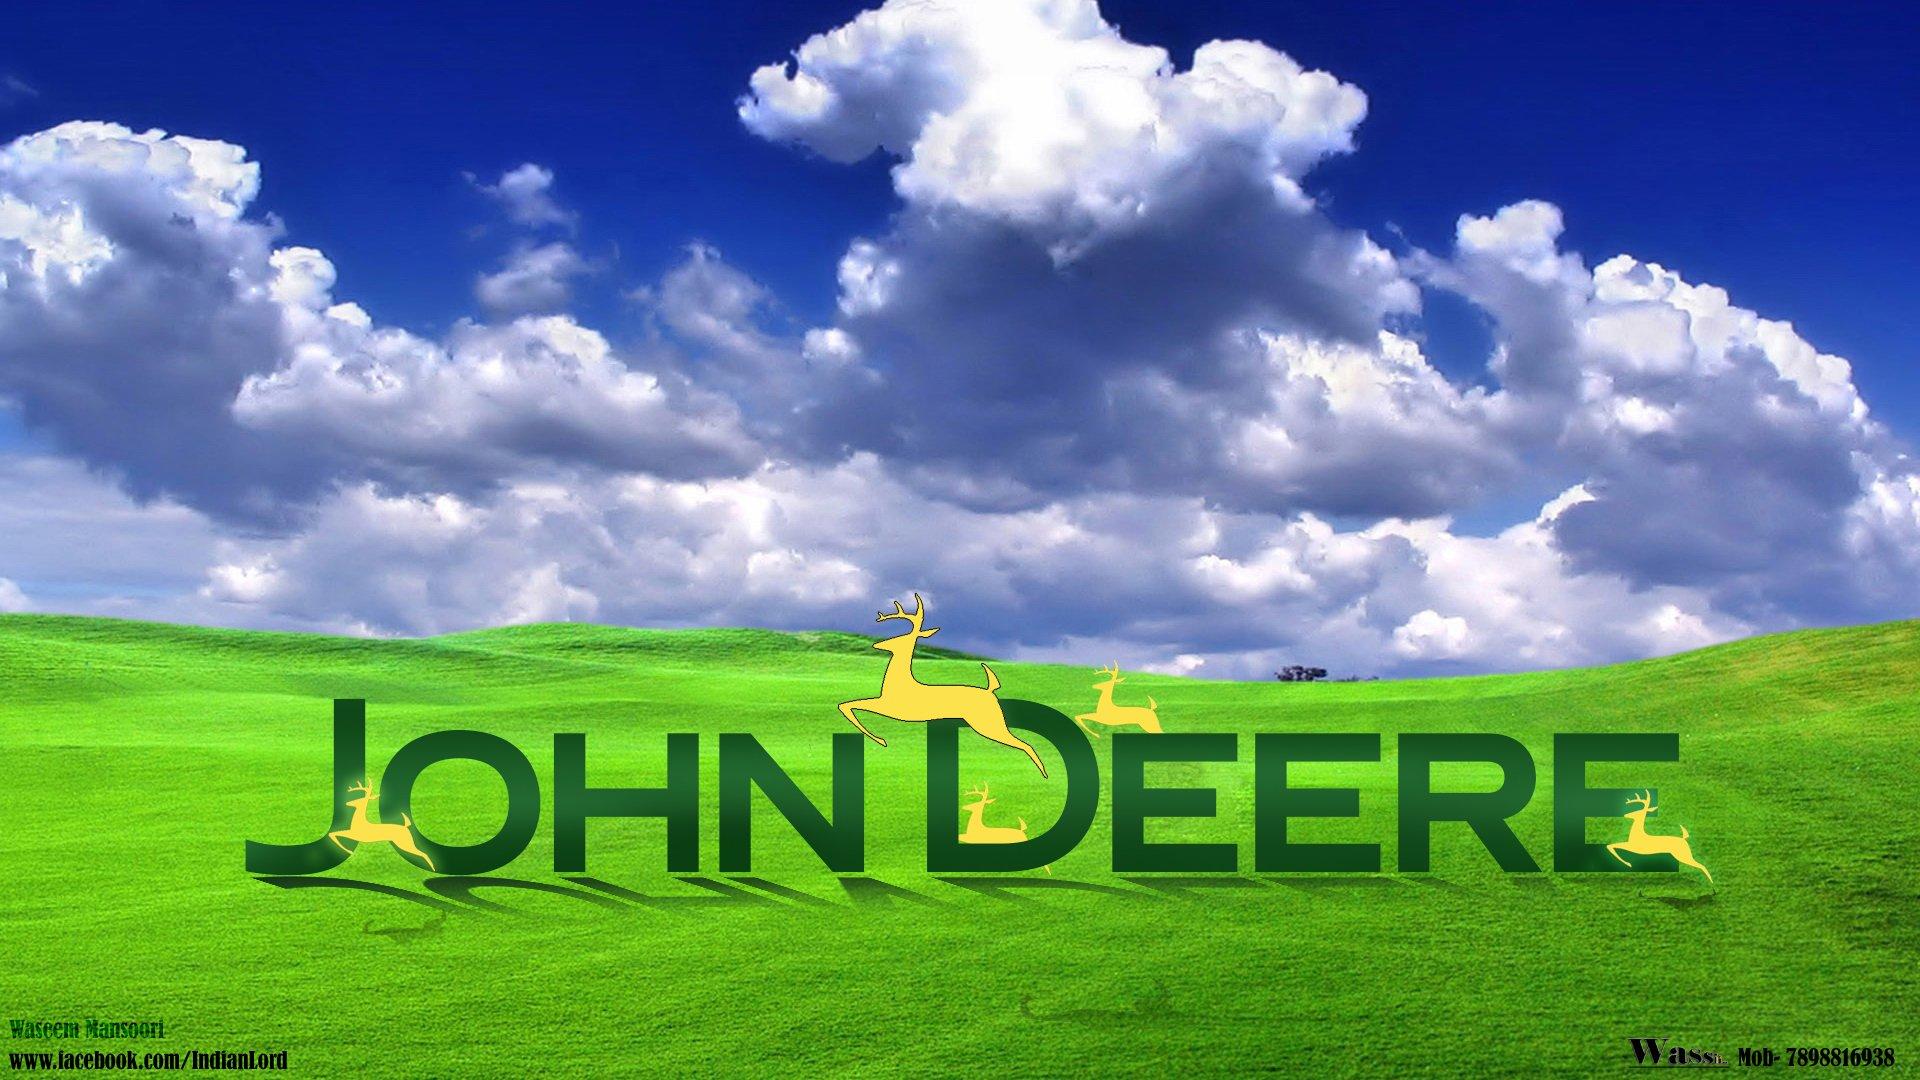 John Deere Logo Wallpaper 1920x1080